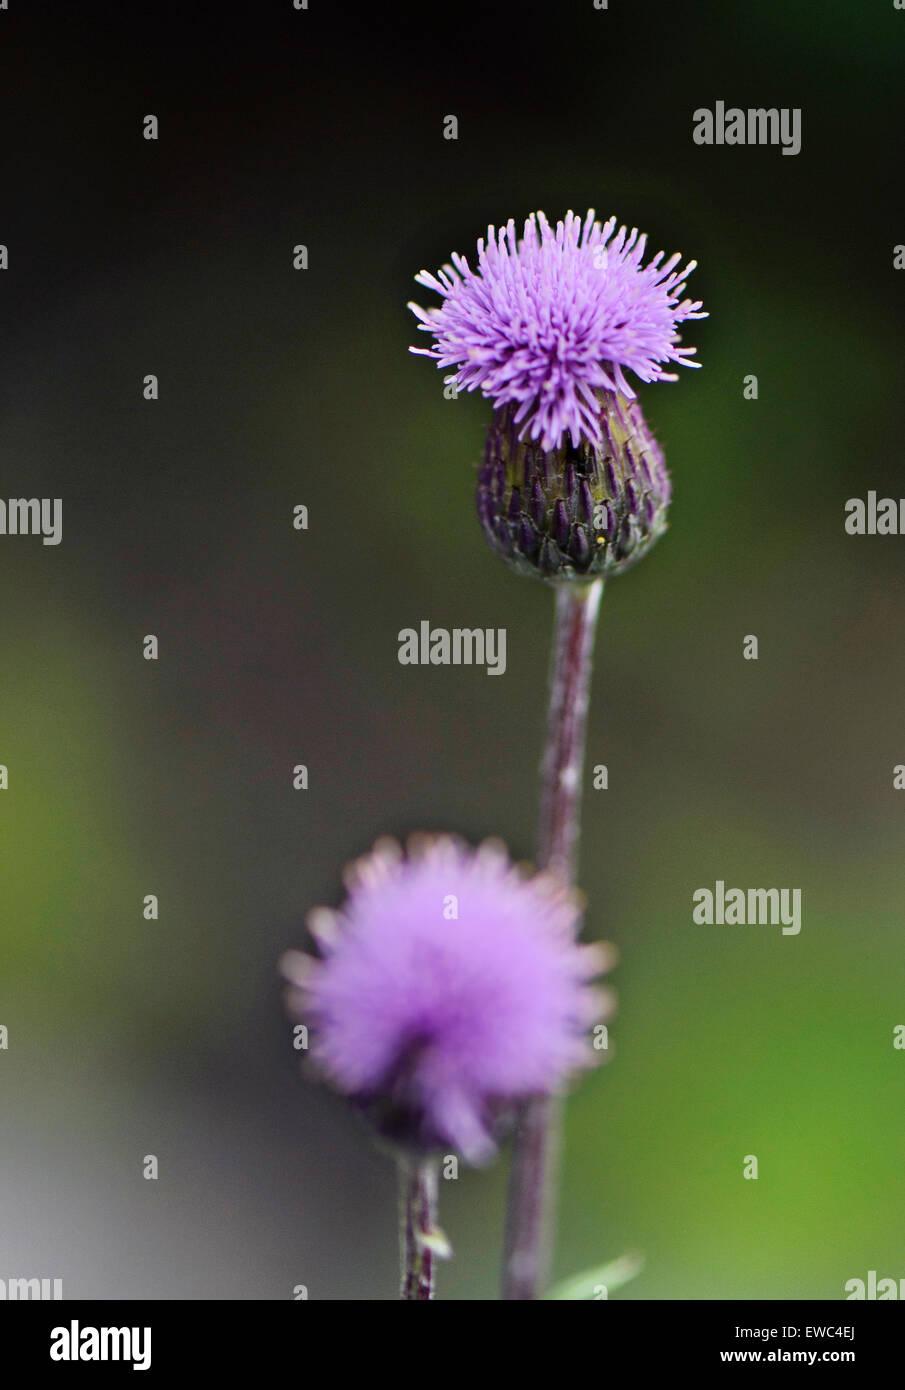 Purple Clover Flower Stock Photo 84474842 Alamy